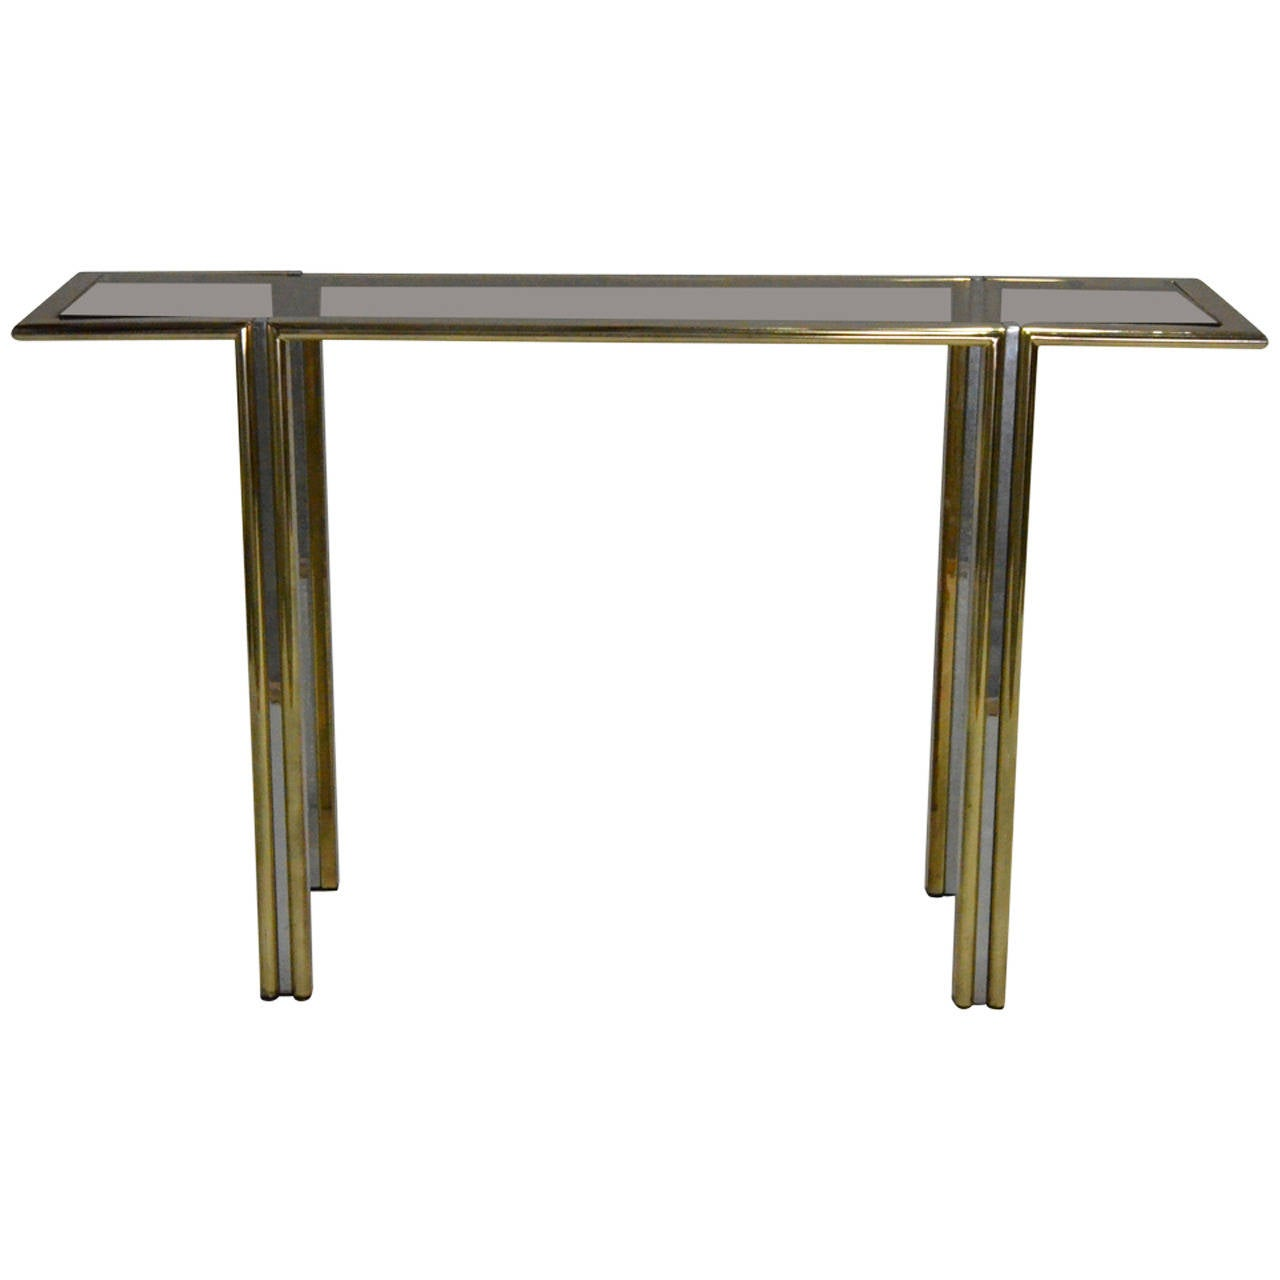 Romeo Rega Italian Mid Century Modern Brass, Chrome, Steel & Glass Console